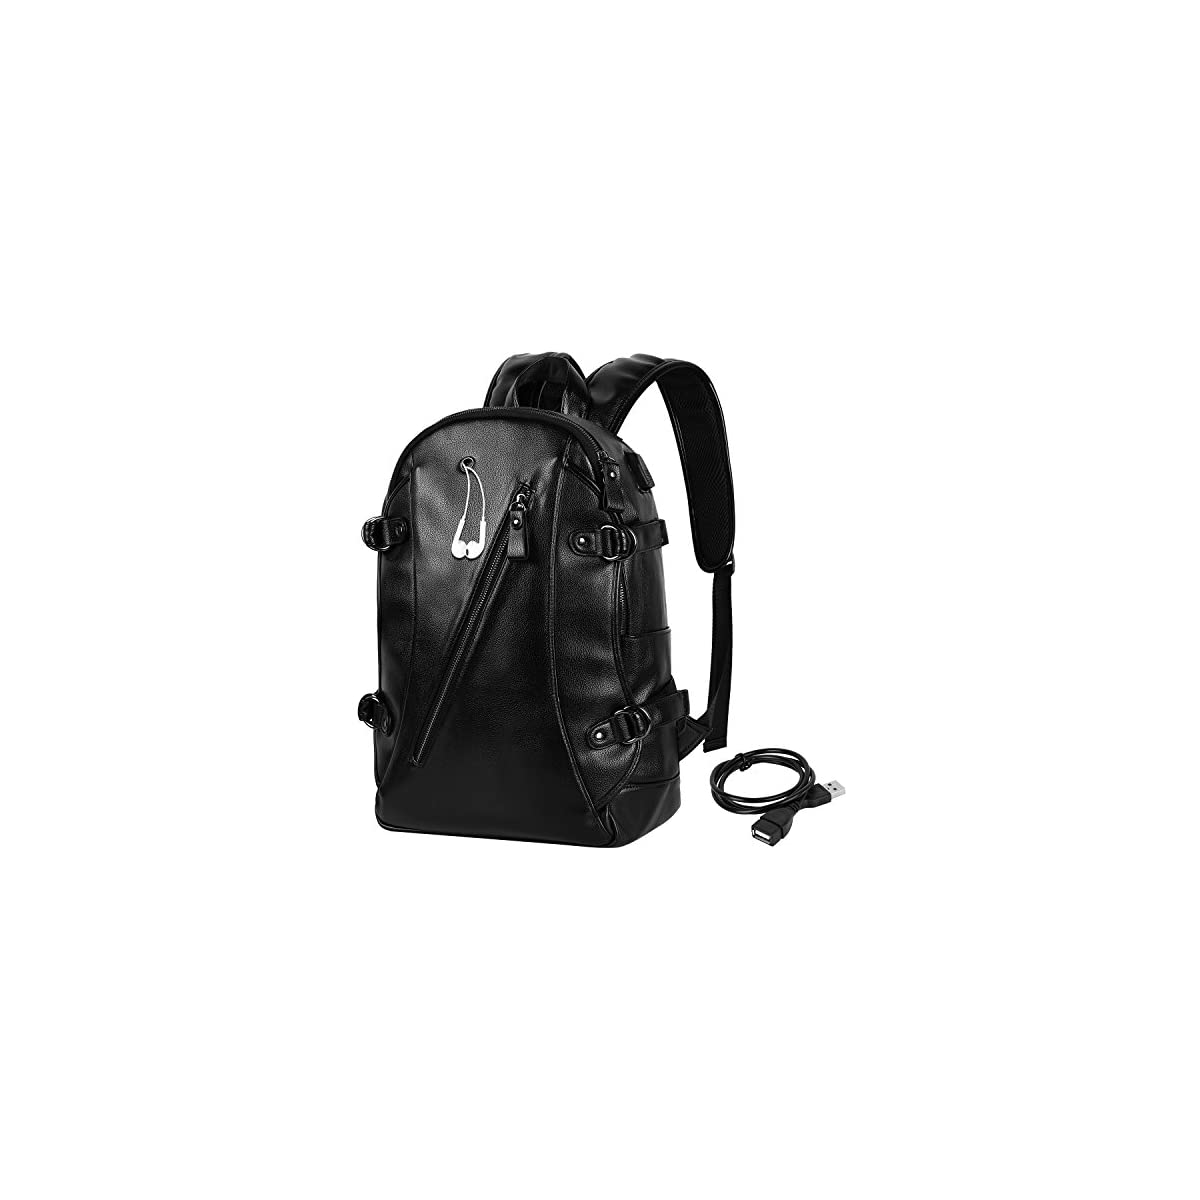 51cGJaQ78aL. SS1200  - VBG VBIGER Mochila para Hombre, de Piel sintética, de 15.6 Pulgadas, para Laptop, Vintage, Casual, Mochila de Viaje, Mochila Escolar con Puerto de Carga USB